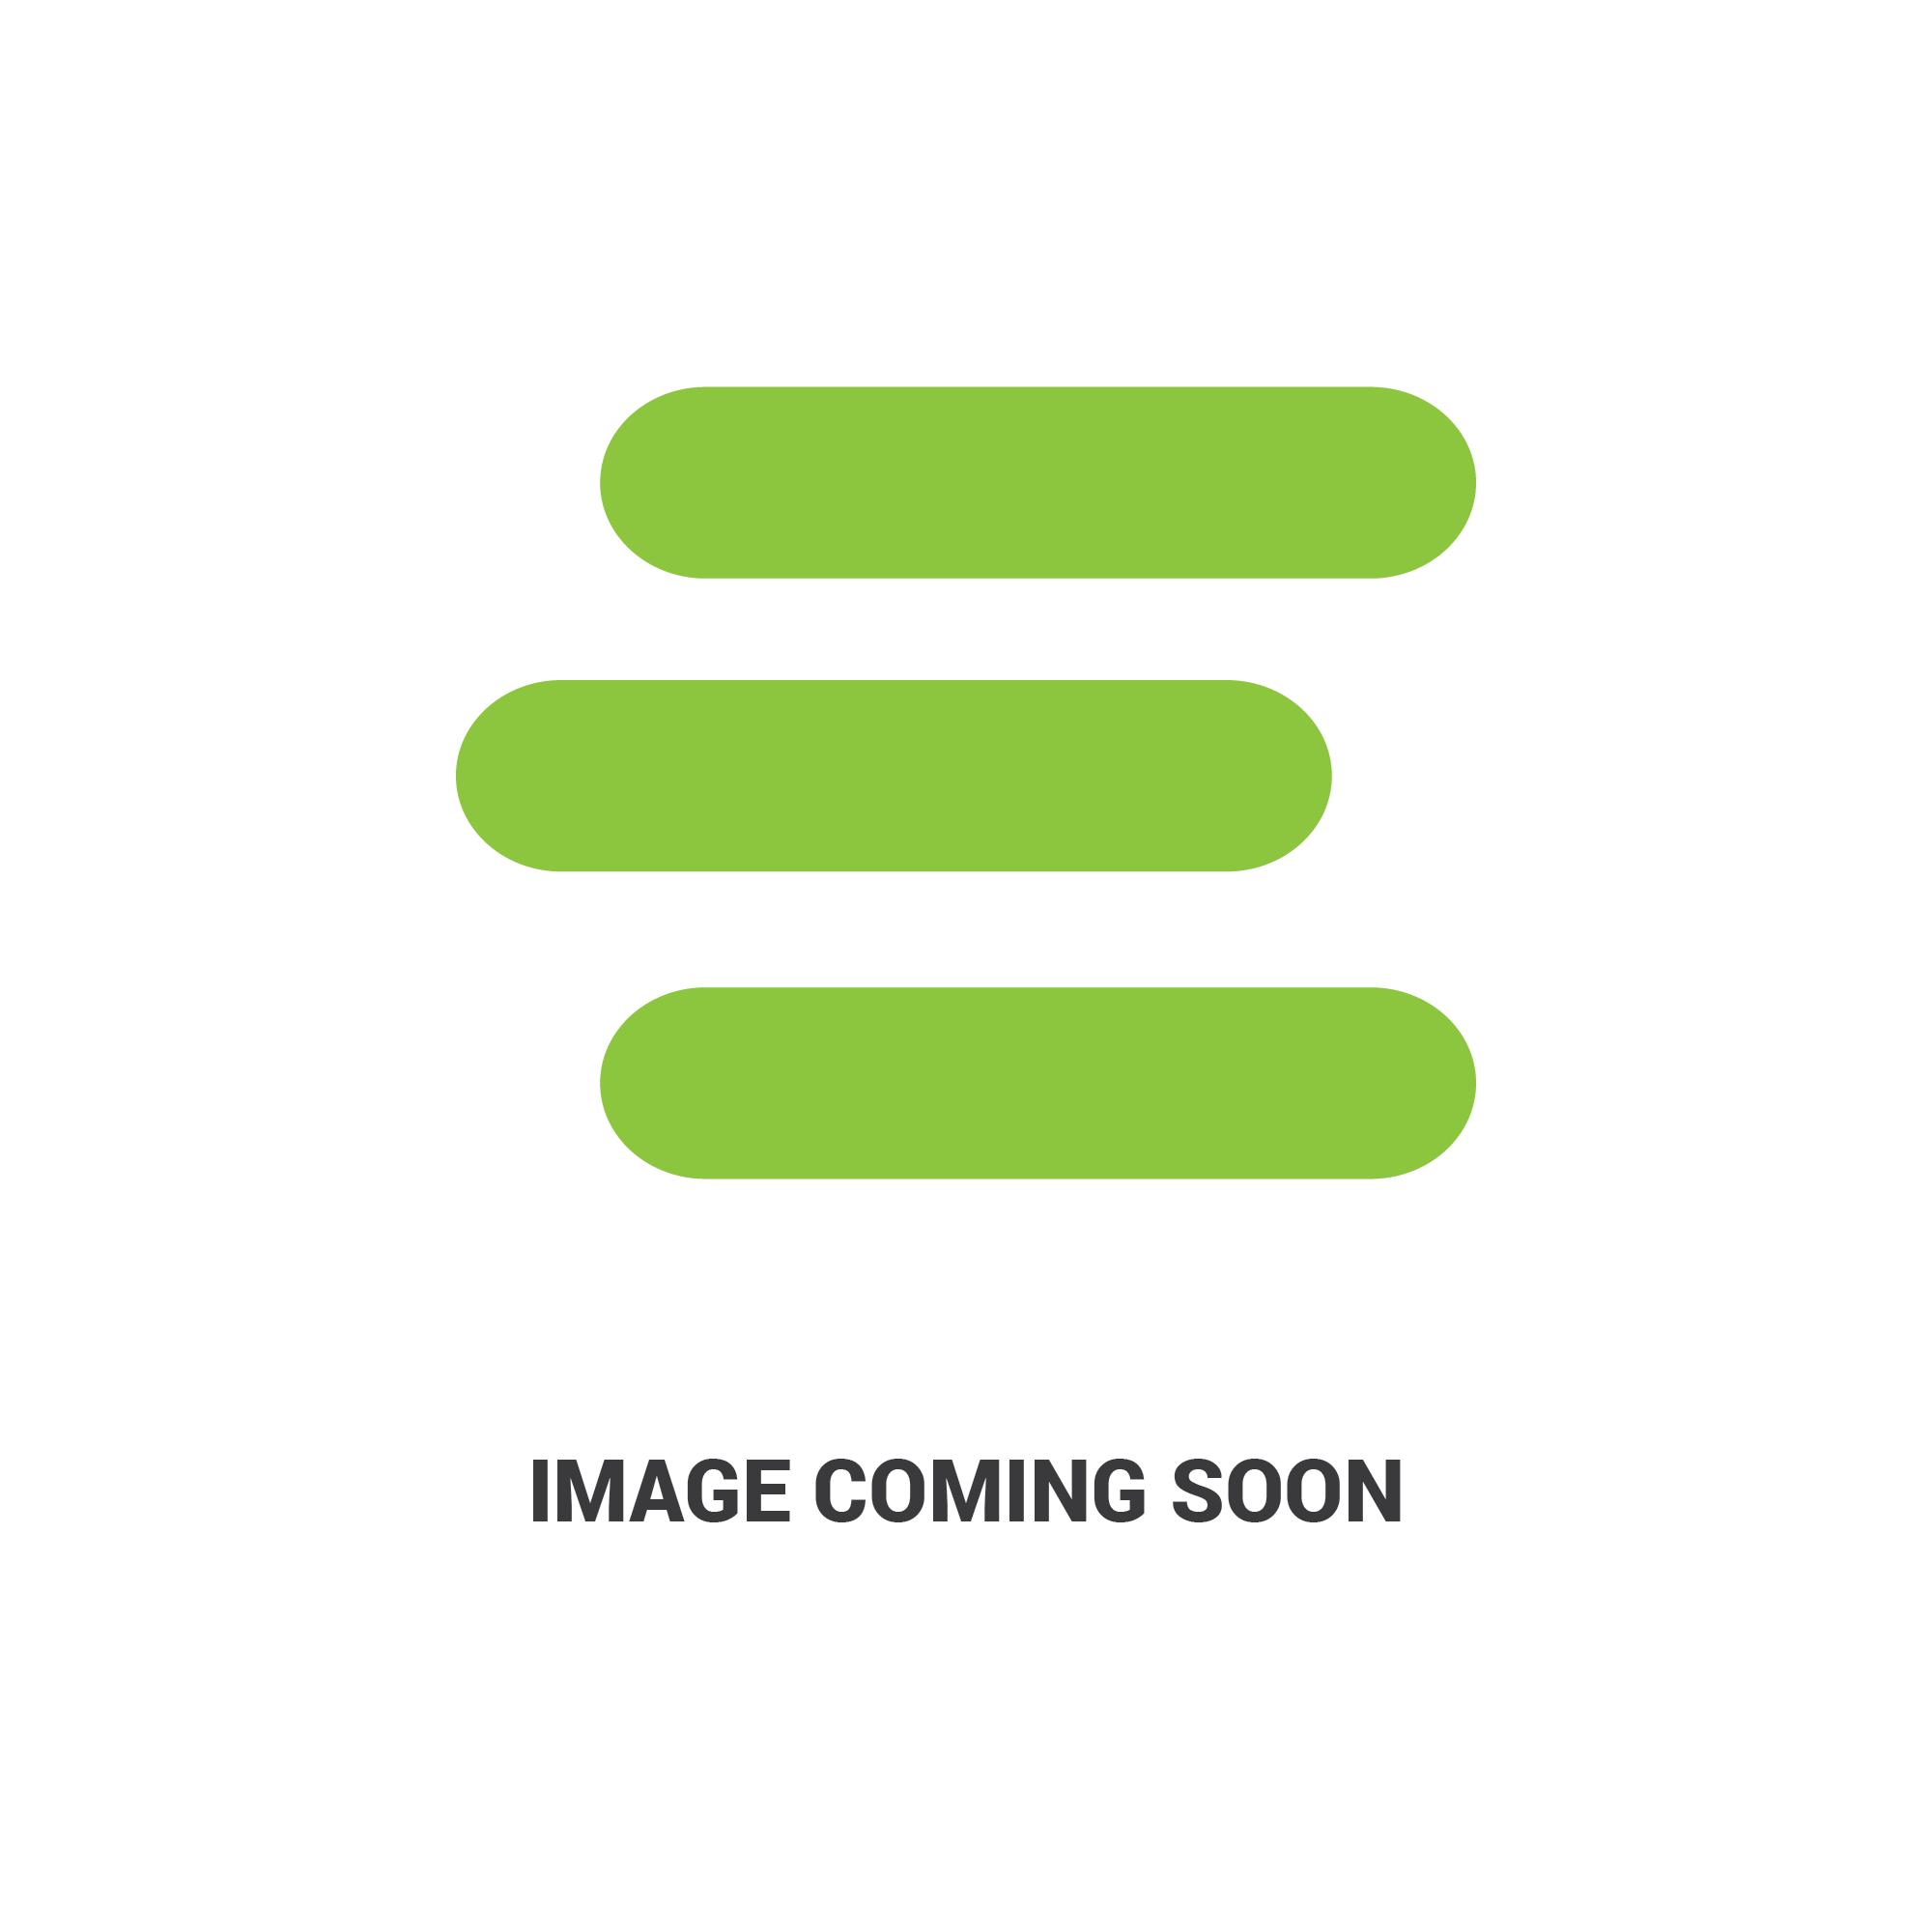 E-68881-53540edit 230.jpg